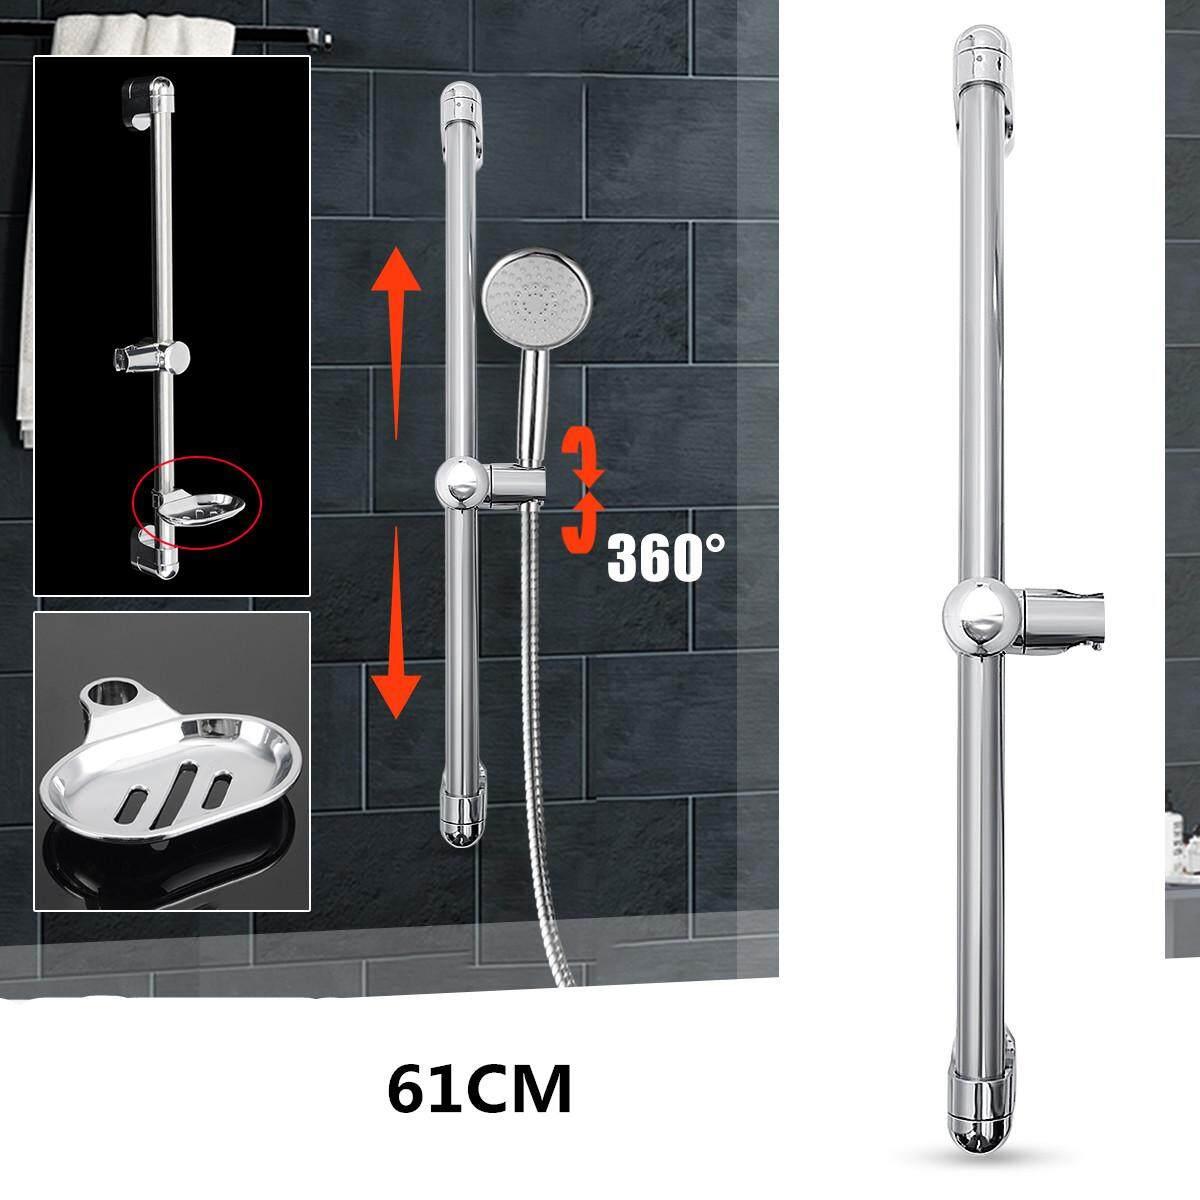 Chrome Shower Head Rail Holder Riser Slide Bar Soap Stand Adjustable Bathroom